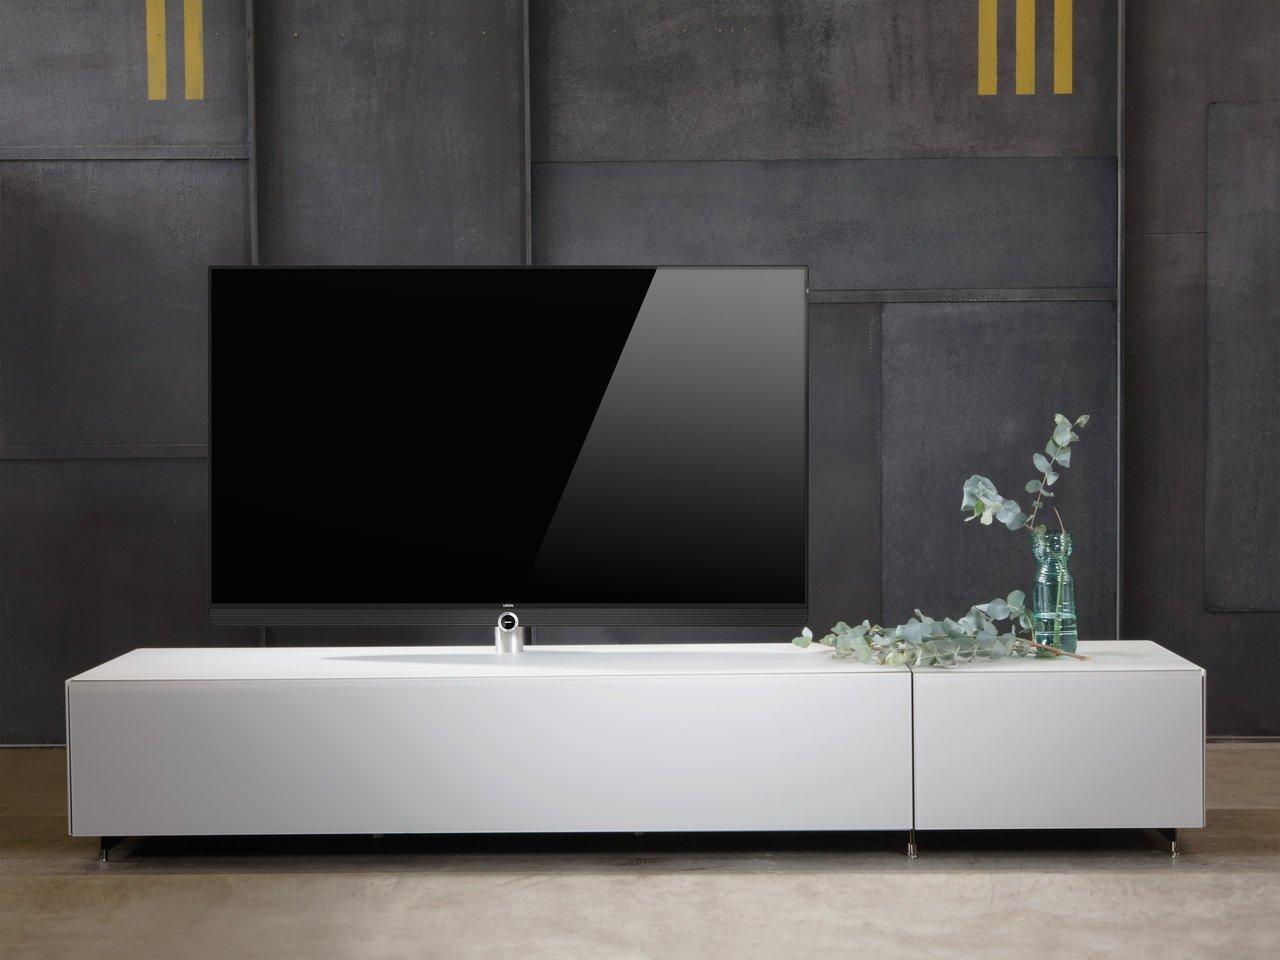 spectral tv m bel ma geschneidert f r loewe produkte loewe. Black Bedroom Furniture Sets. Home Design Ideas